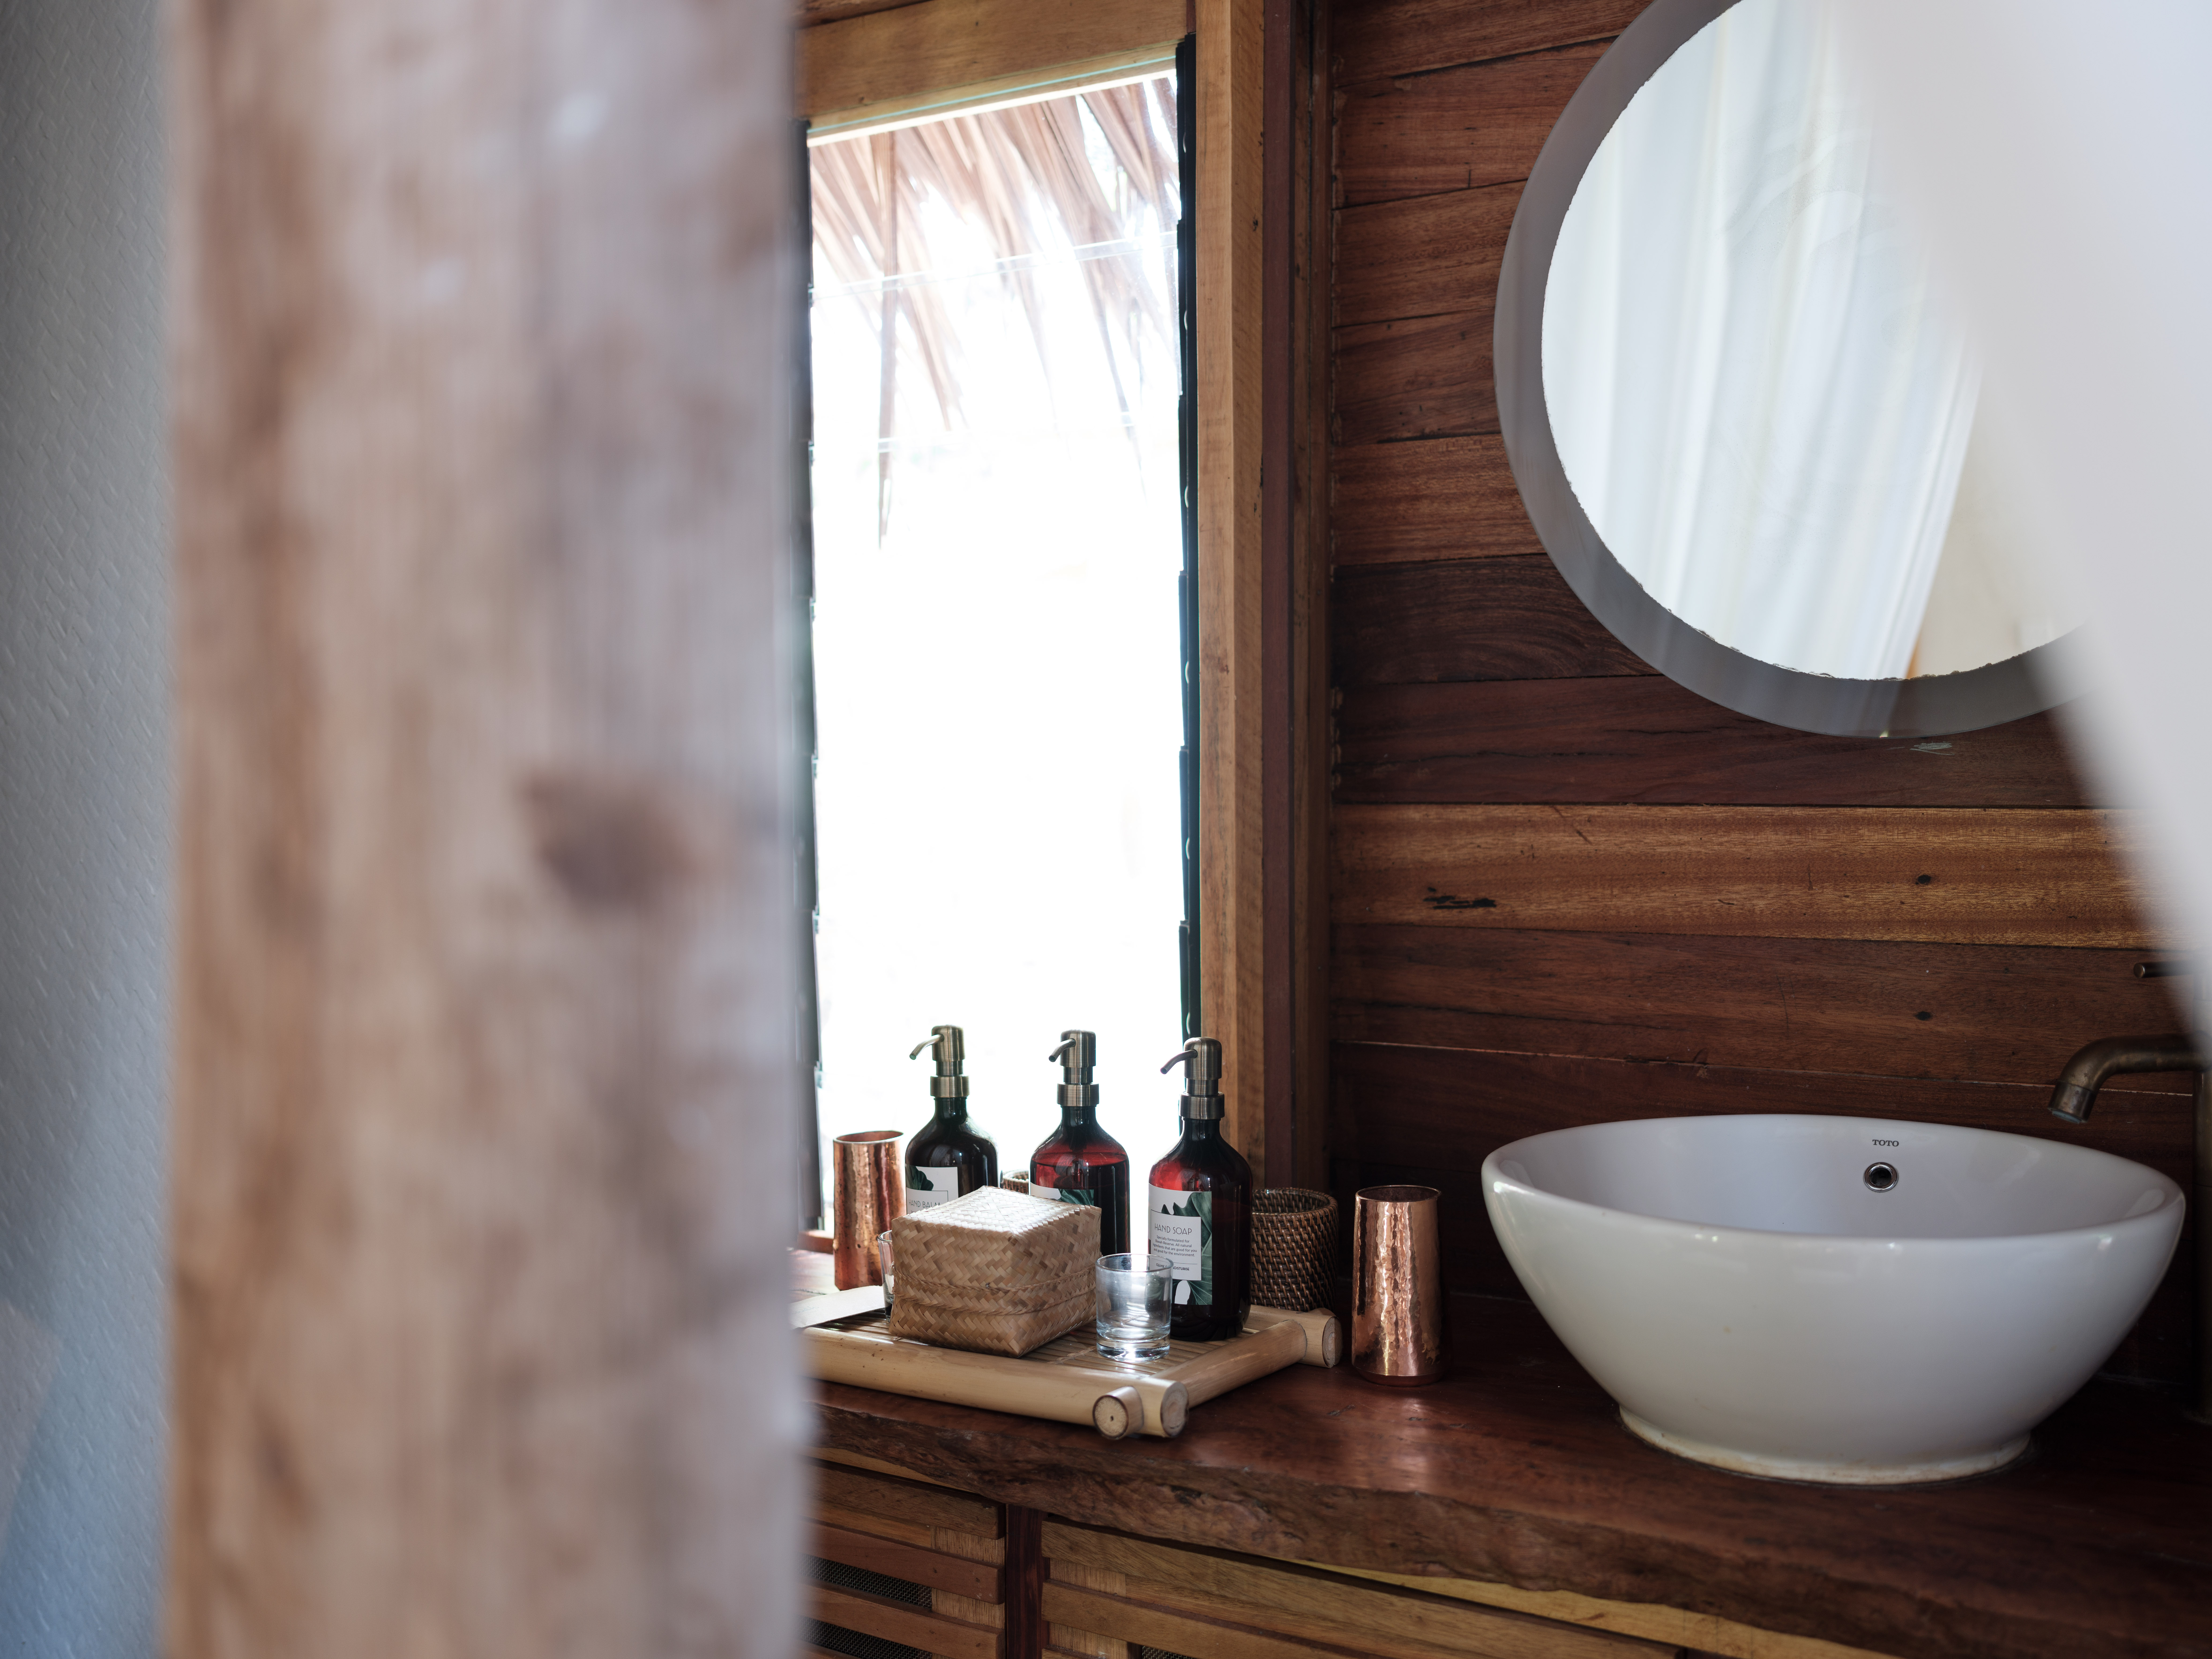 round_white_bathroom_mirrors_with_basin_soap_dispenser_bottles_jungle_lodge (1)